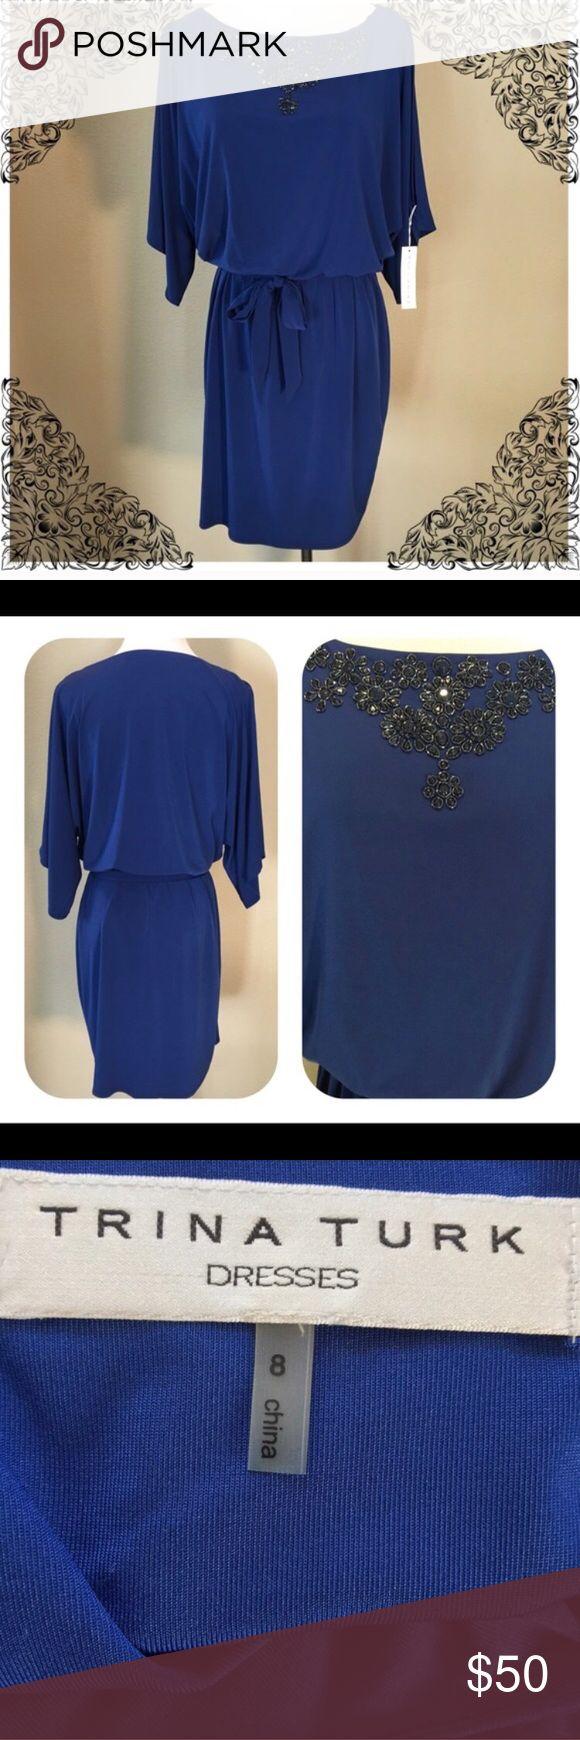 New with tags Cobalt Trina Turk dress RePosh. New with Tags Cobalt Blue Trina Turk dress Beautiful beaded neckline. Short Sleeves with cutouts. Trina Turk Dresses